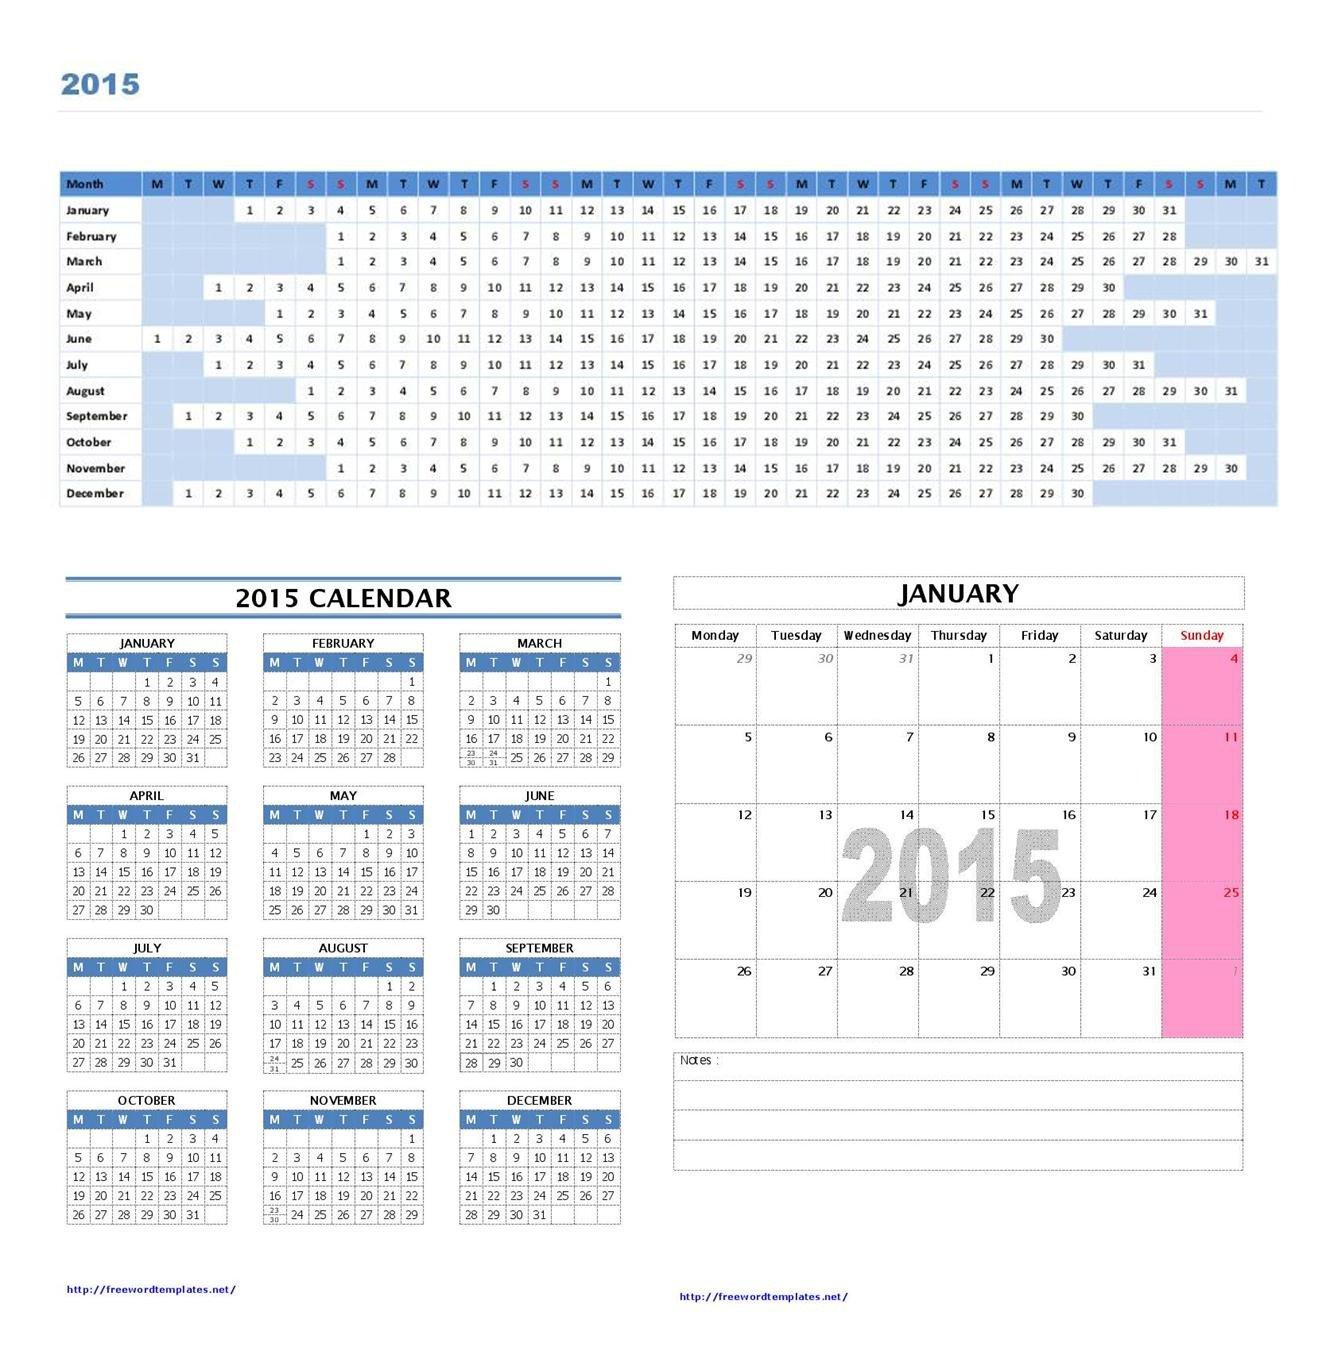 Calendar Template for Word 2015 Calendar Templates